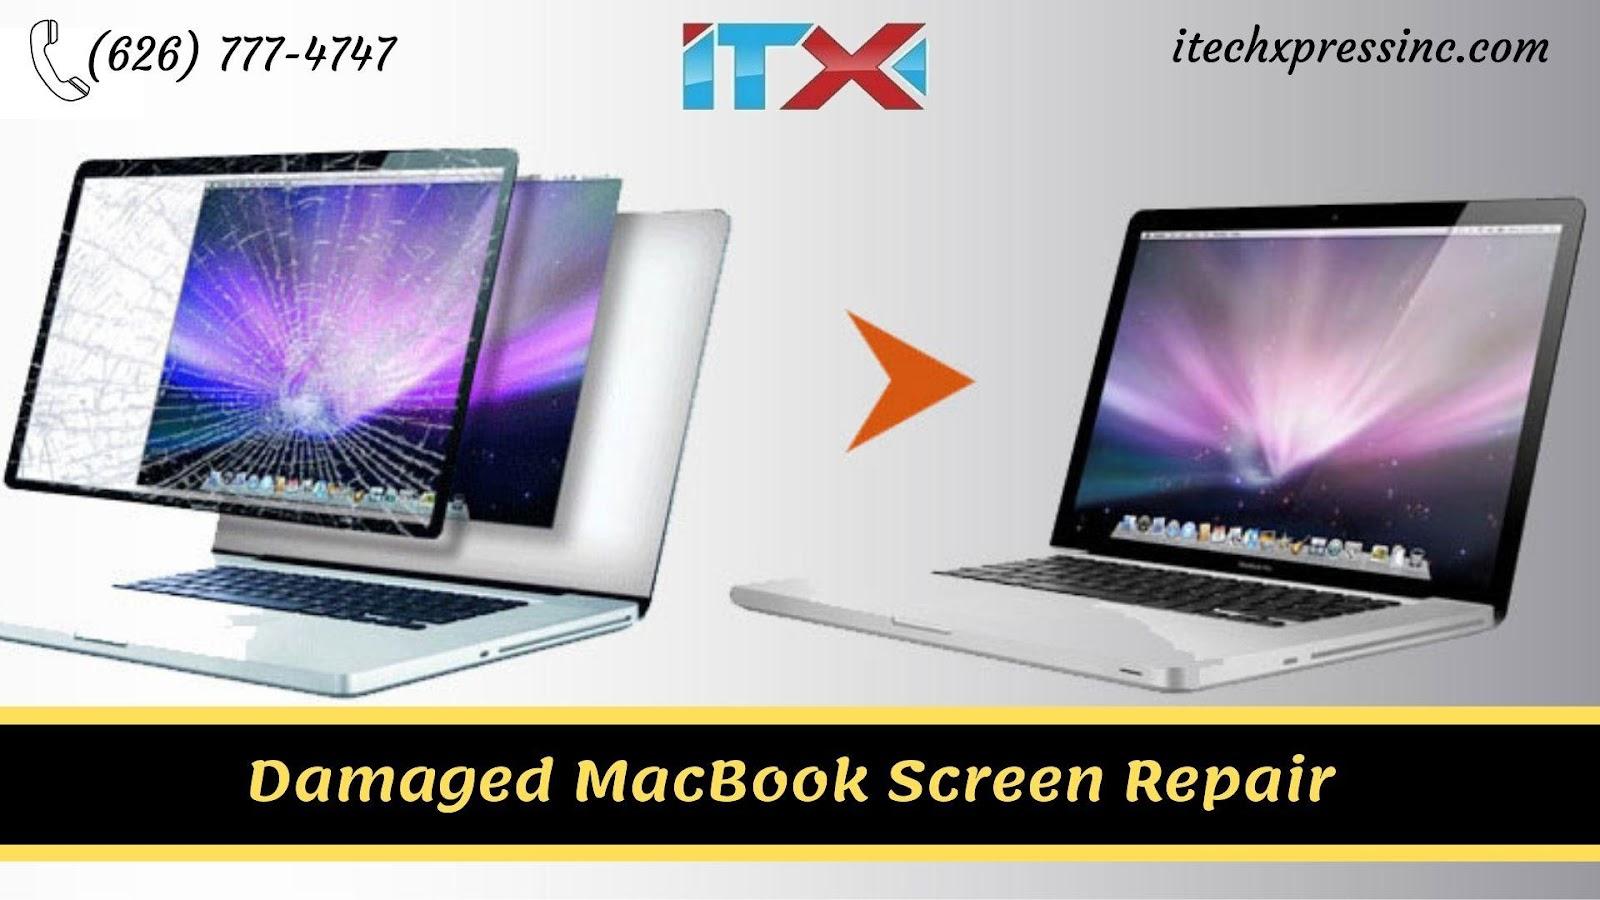 F:\koyel\my project\monday\itechxpressinc.com\blog content\09.03.2019\Damaged MacBook Screen Repair.jpg